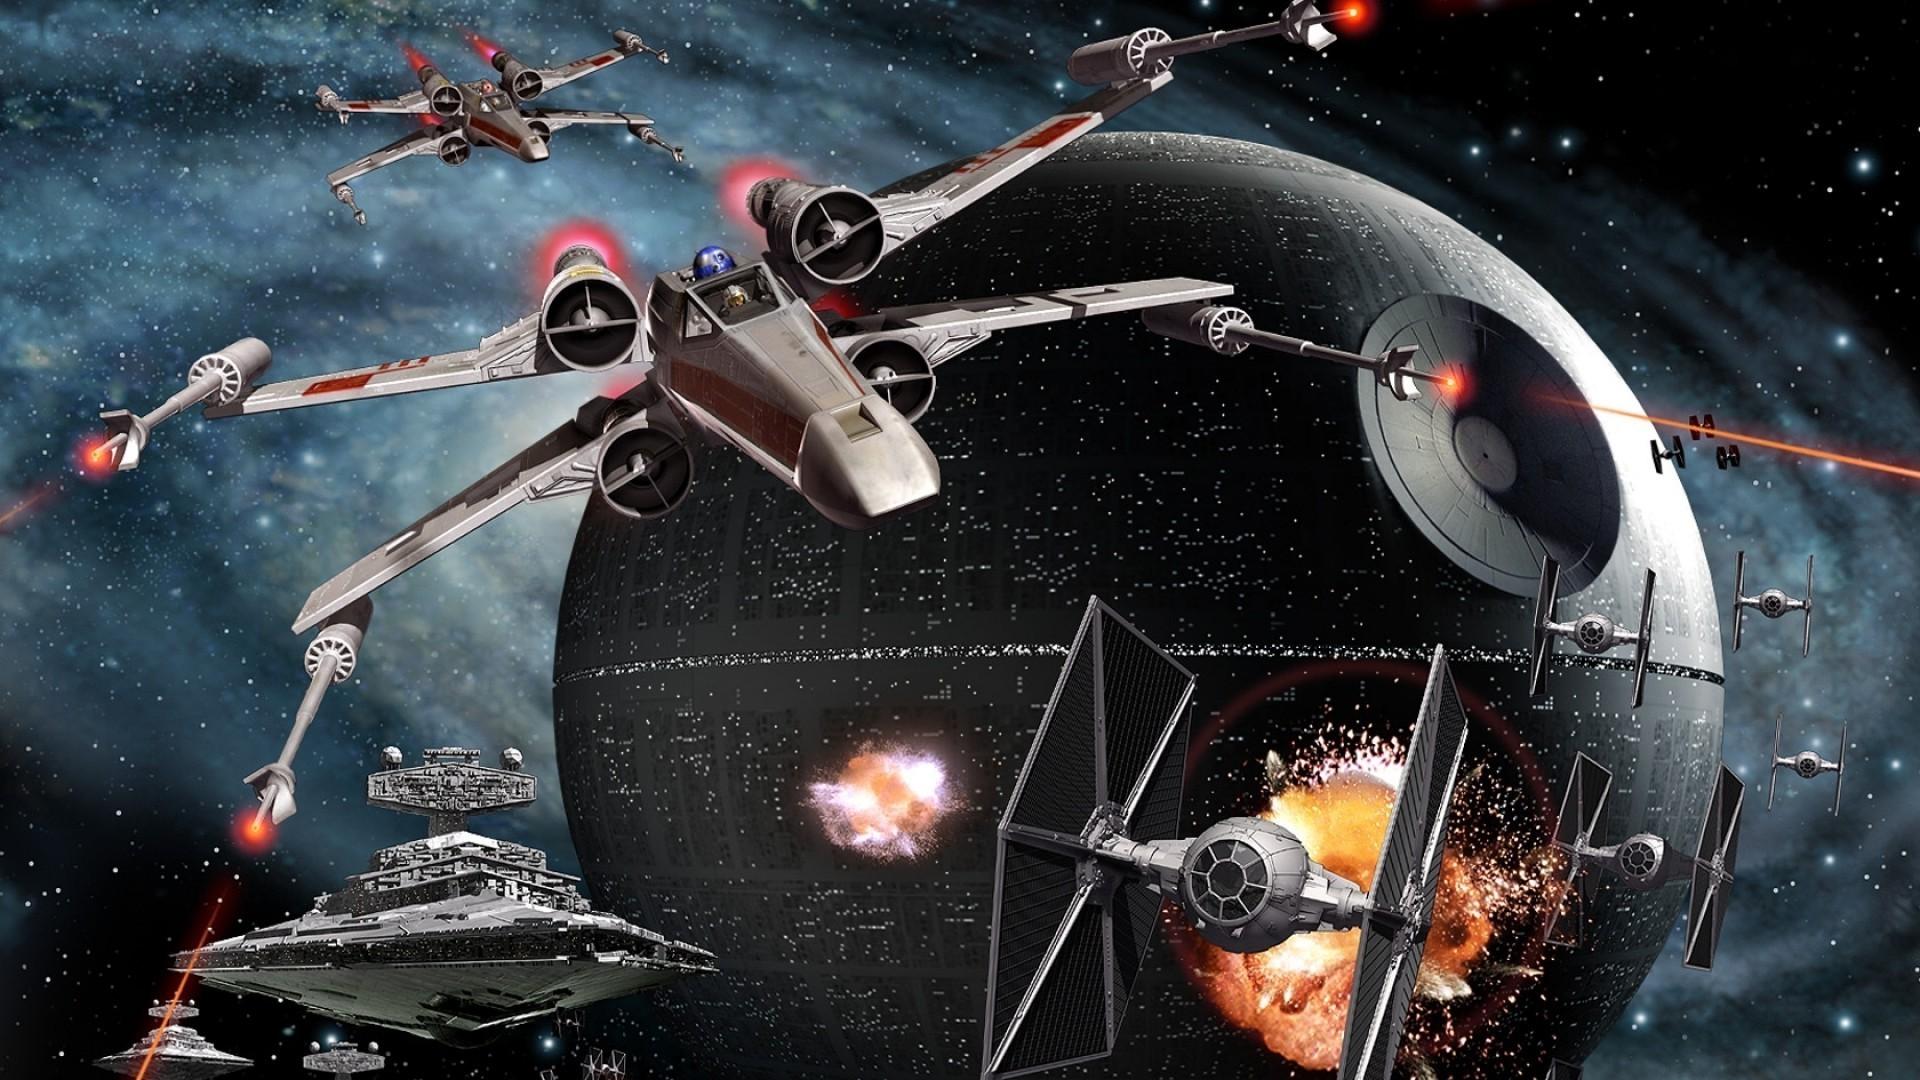 Wallpaper Video Games Vehicle Artwork Tie Fighter Star